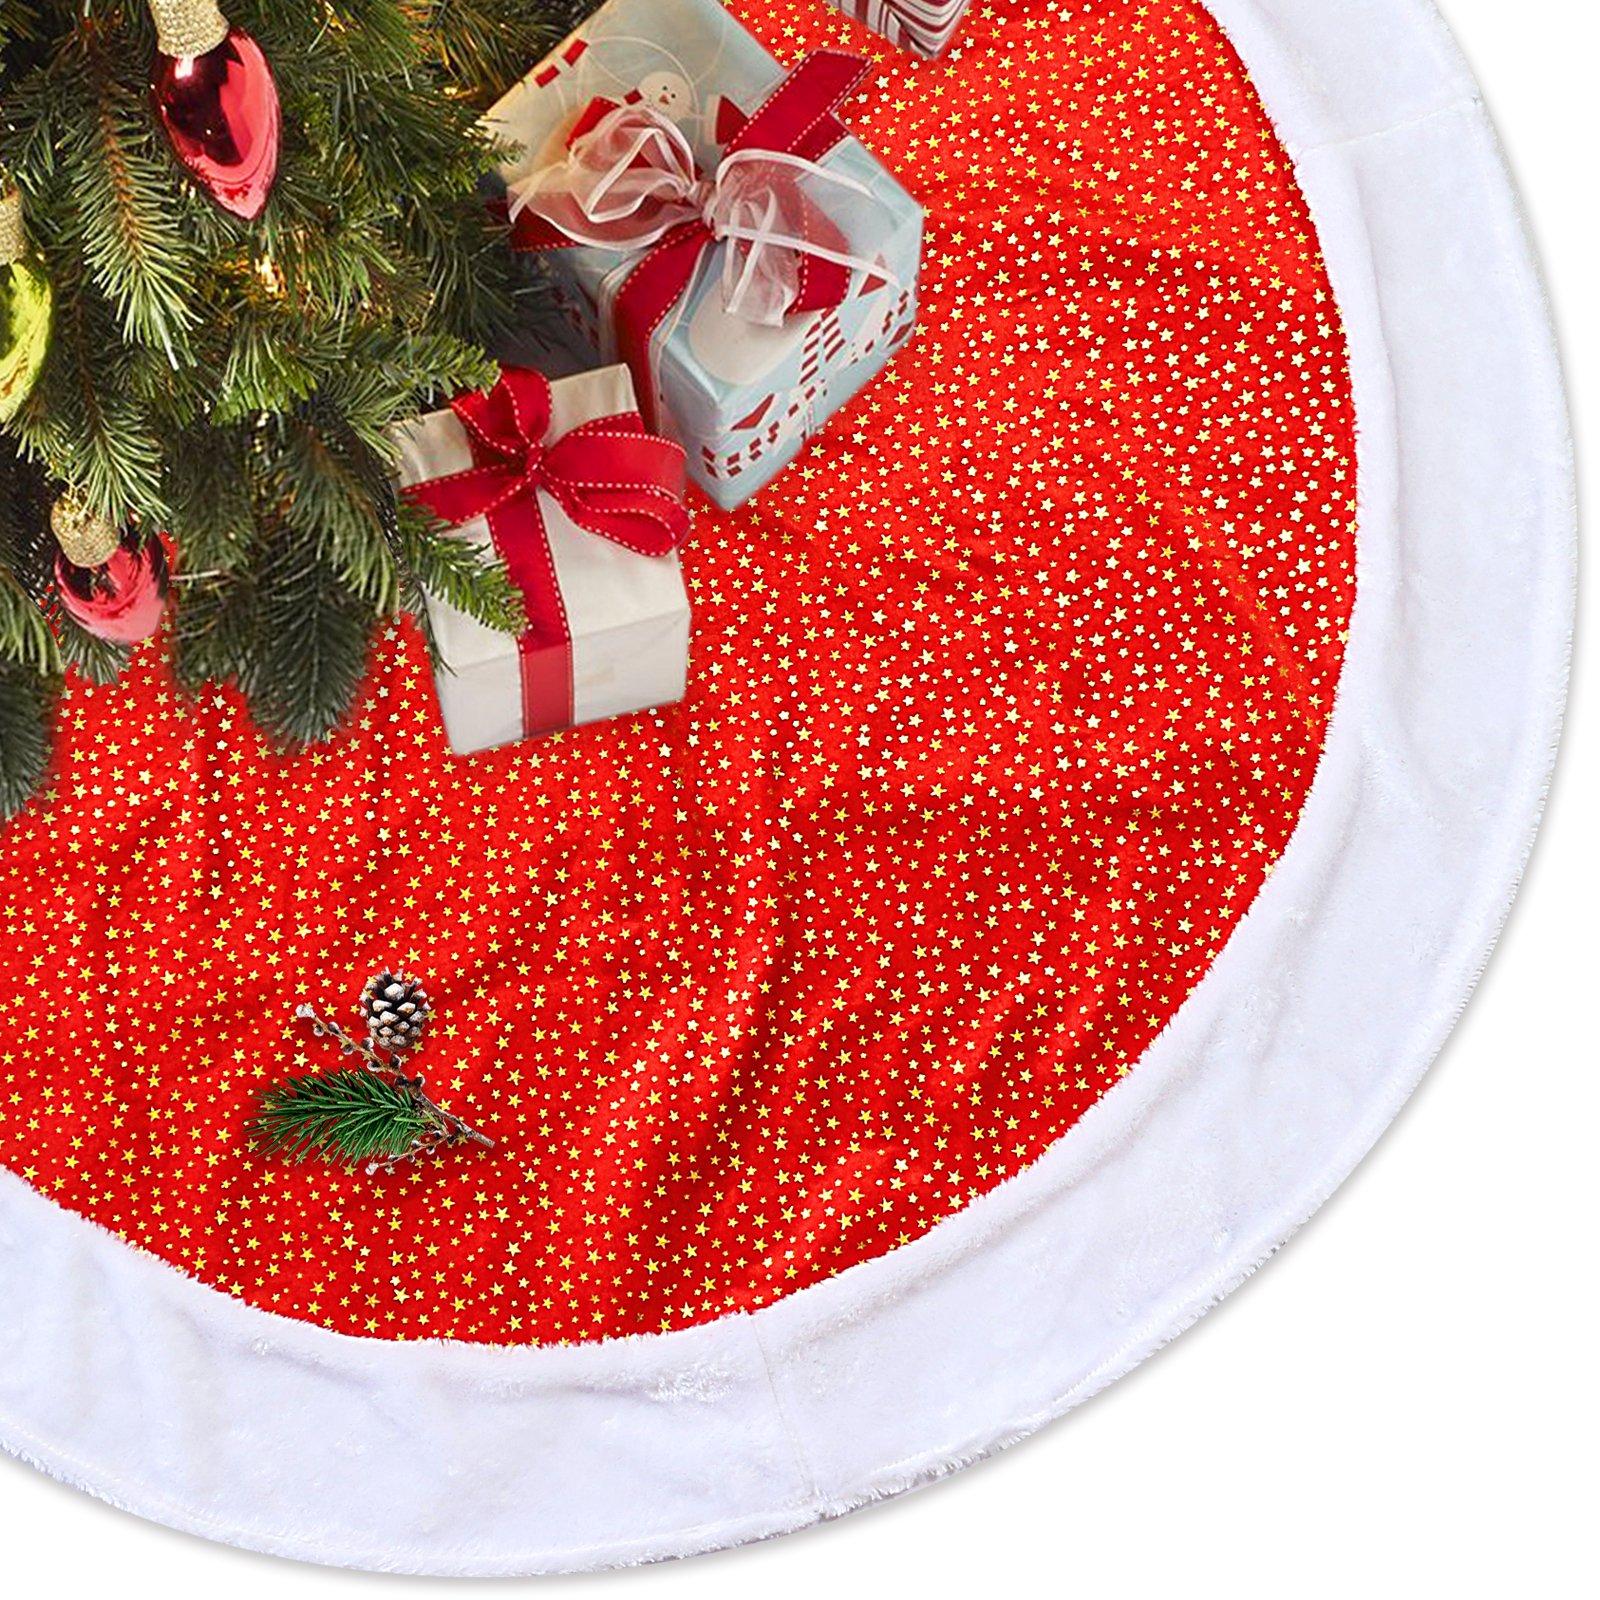 LimBridge 48'' Classic Shining Golden Stars Red Plush Christmas Tree Skirt with White Fur Trim Xmas Holiday Decoration by LimBridge